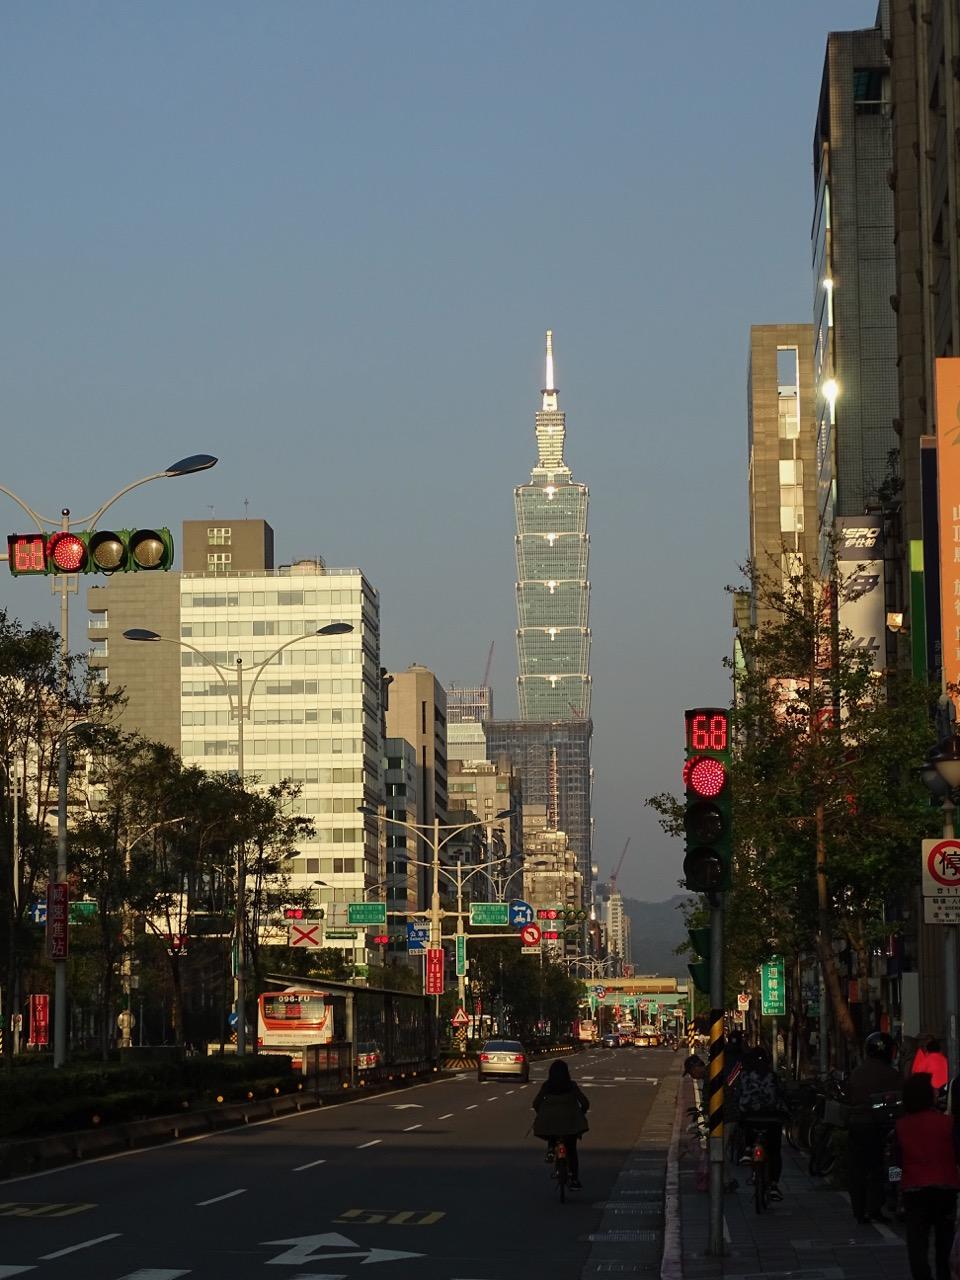 Taipei, the capital of Taiwan